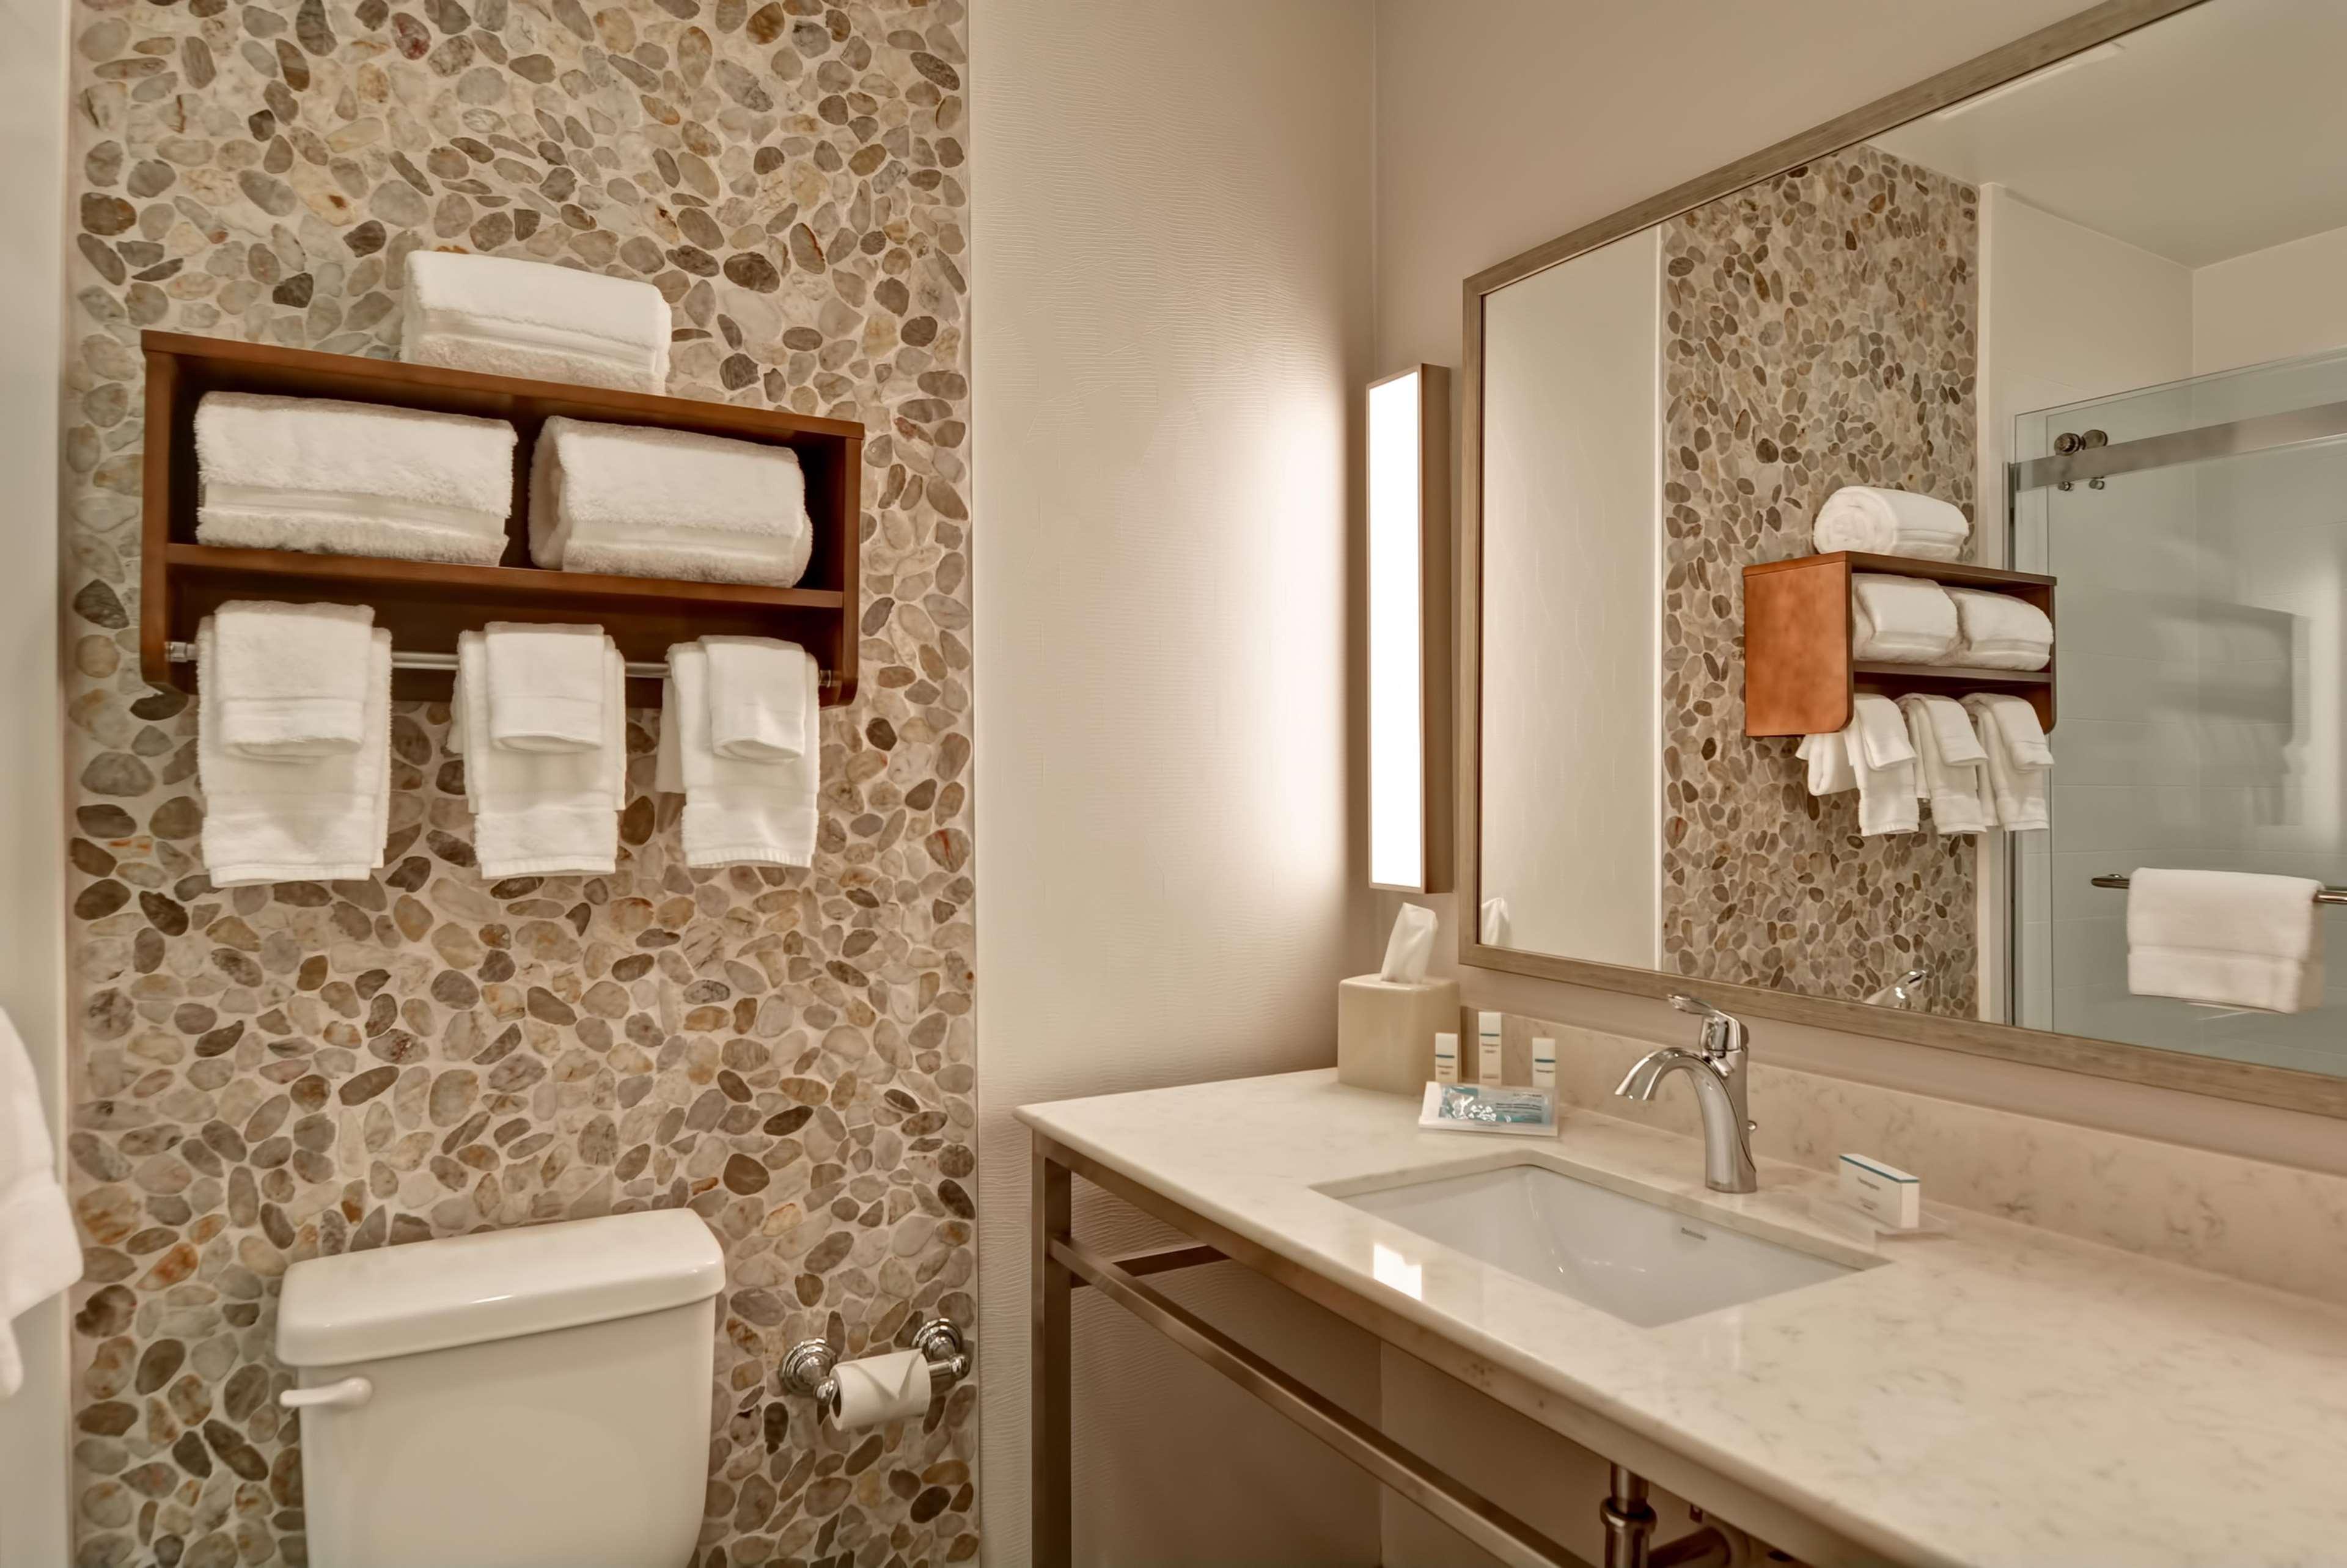 Hilton Garden Inn Phoenix/Tempe ASU Area image 22